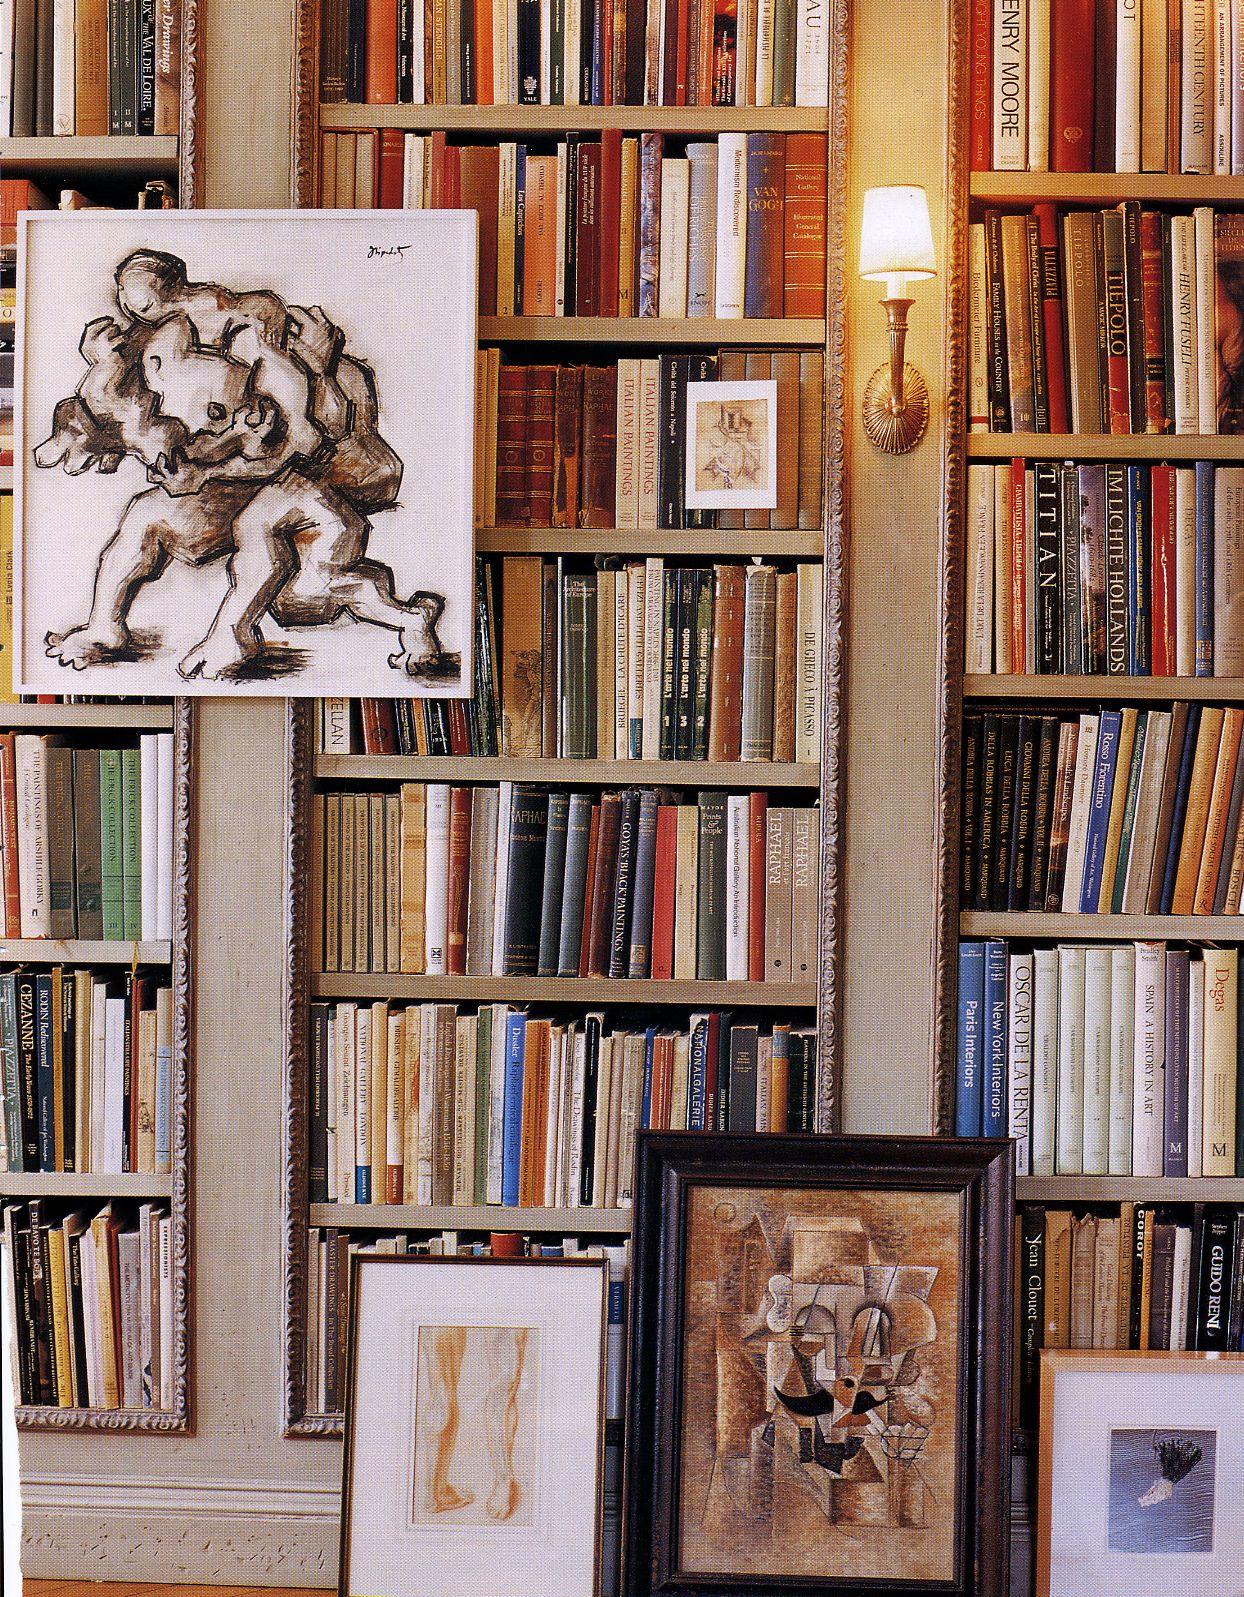 Bookshelf Detail